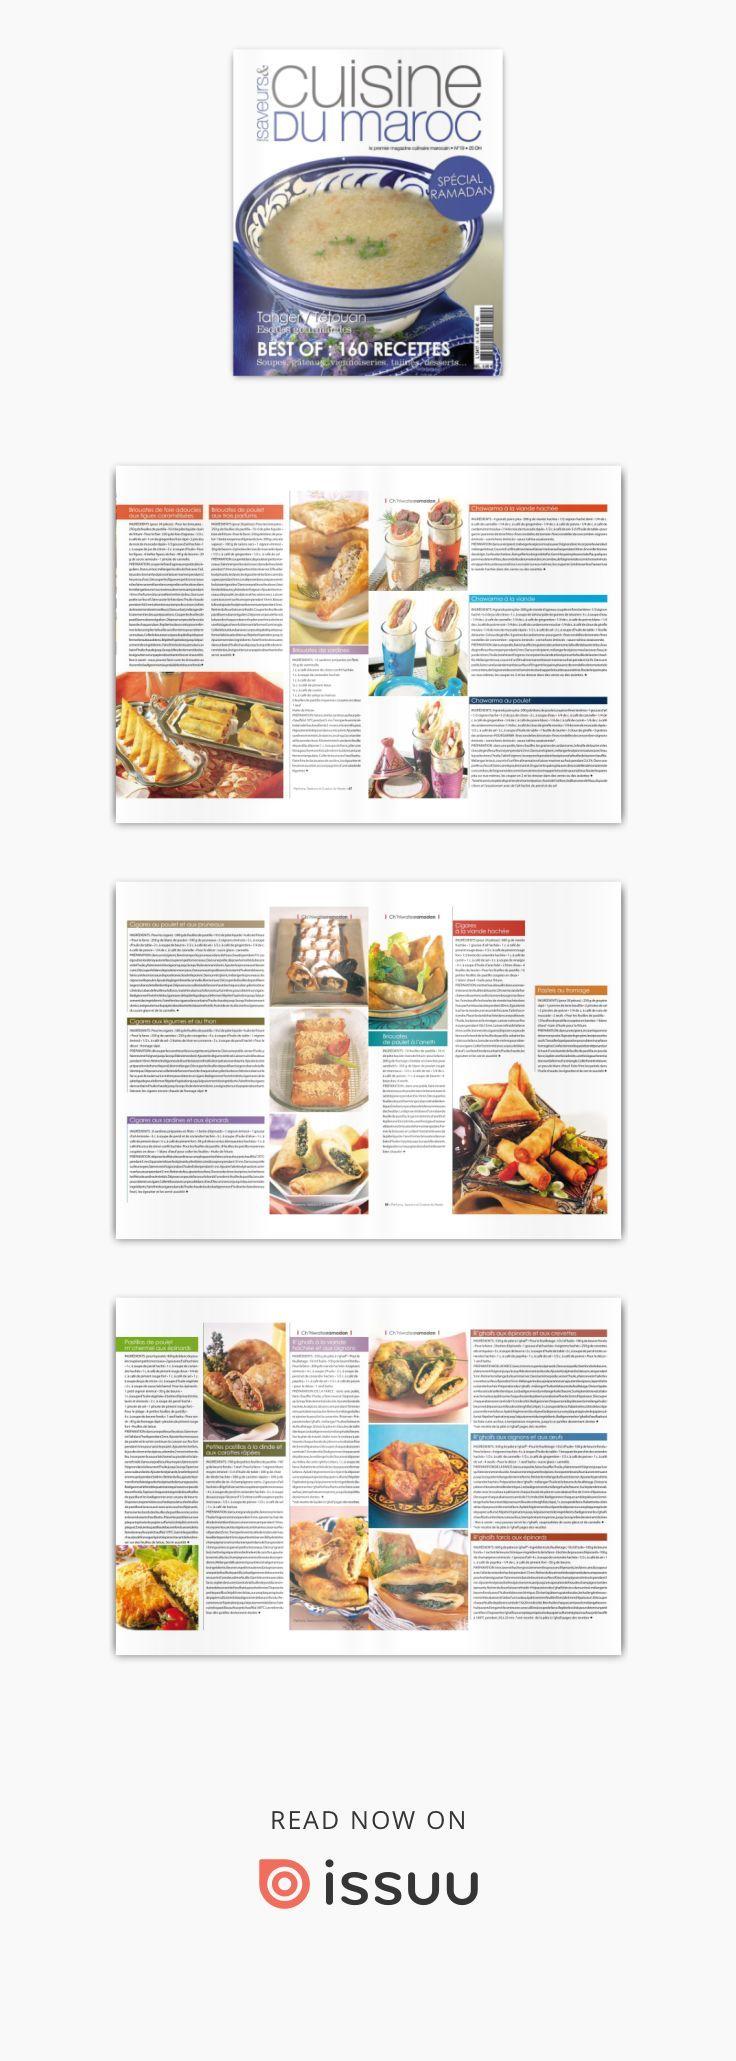 Cuisine du maroc 19 in 2020 Plan de travail, Us